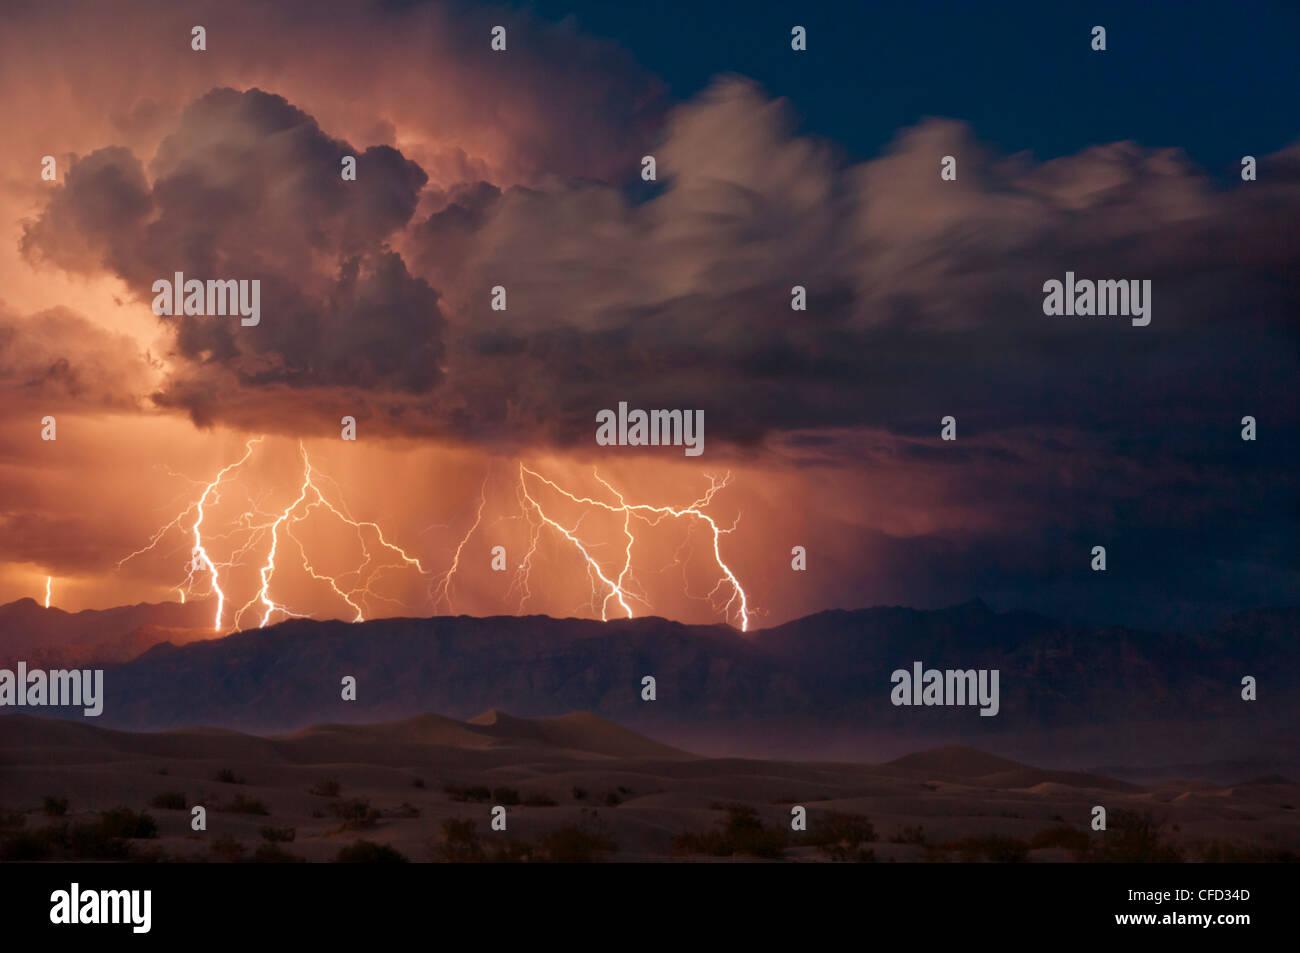 Orage sur l'Amargosa Range, Mesquite Studios, Stovepipe Wells, Death Valley National Park, California, USA Banque D'Images